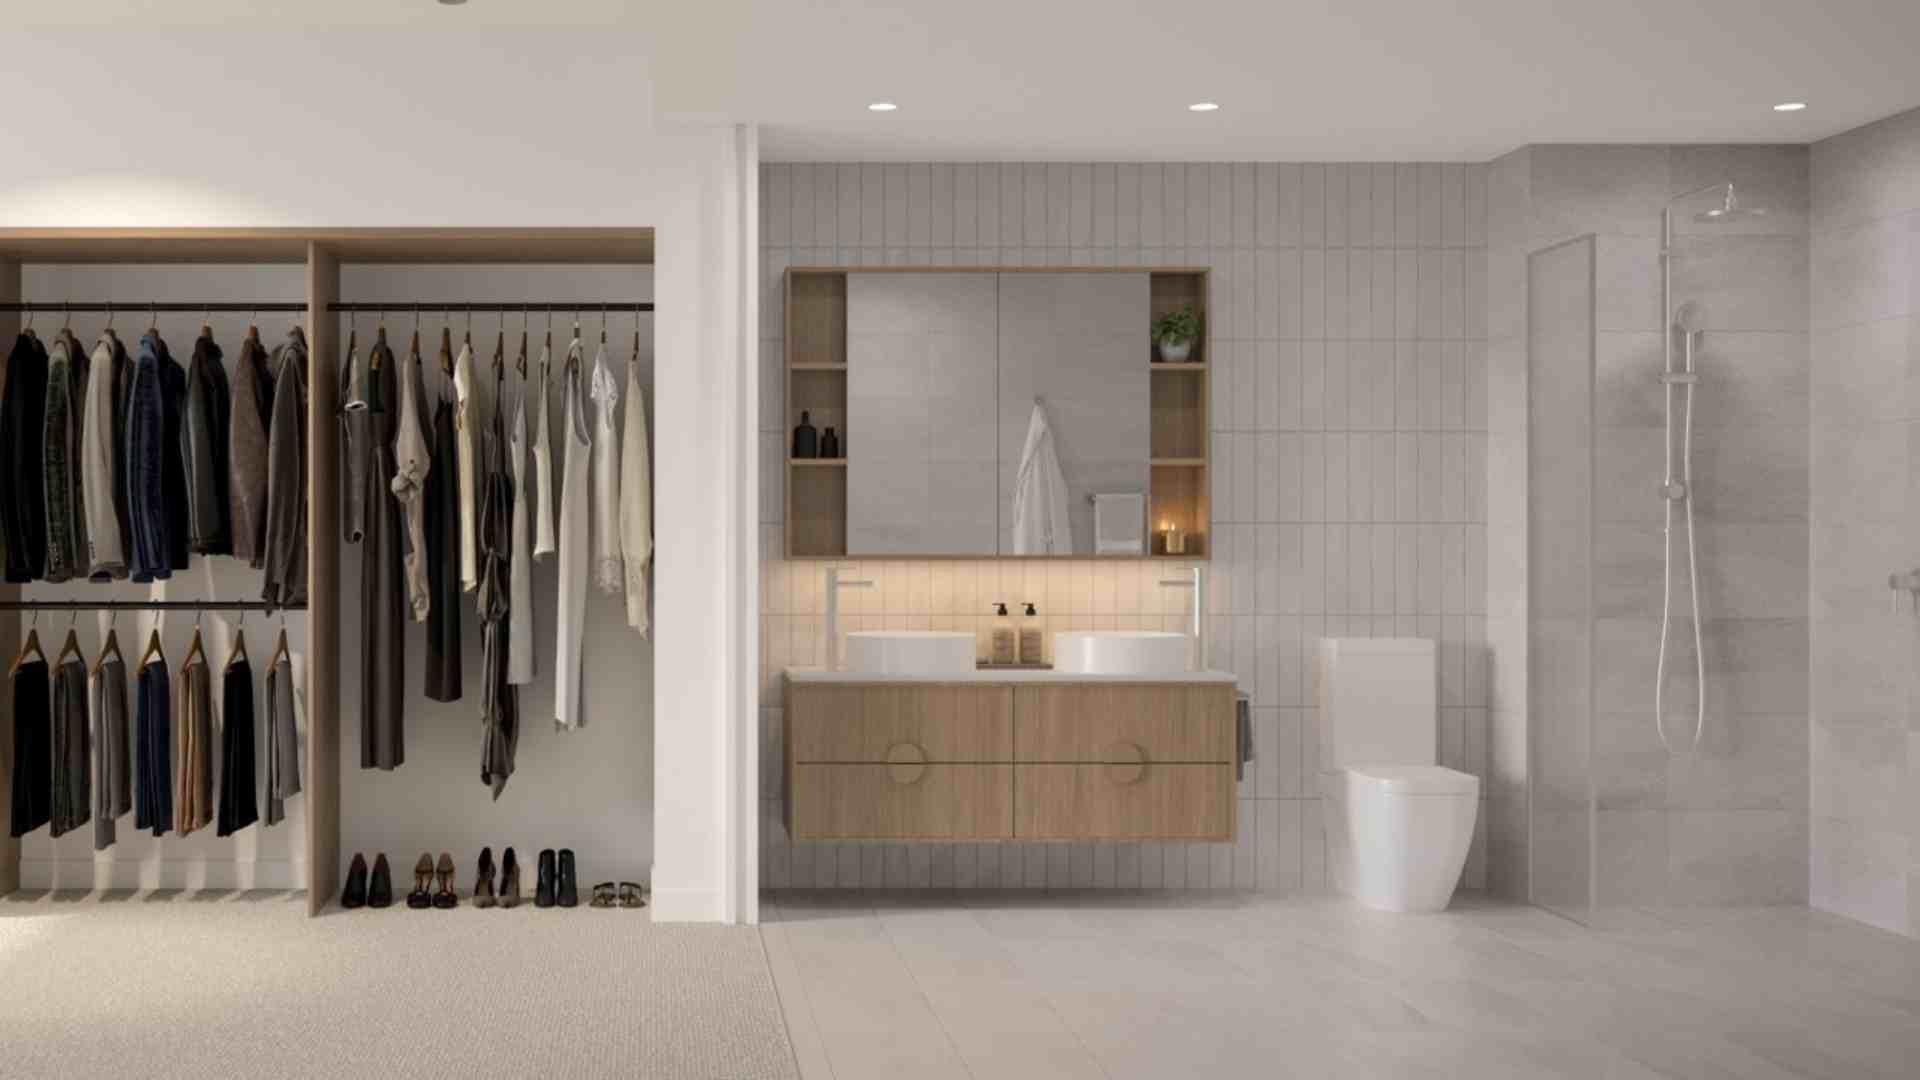 built in wardrobe next to bathroom, ash grey marble shower